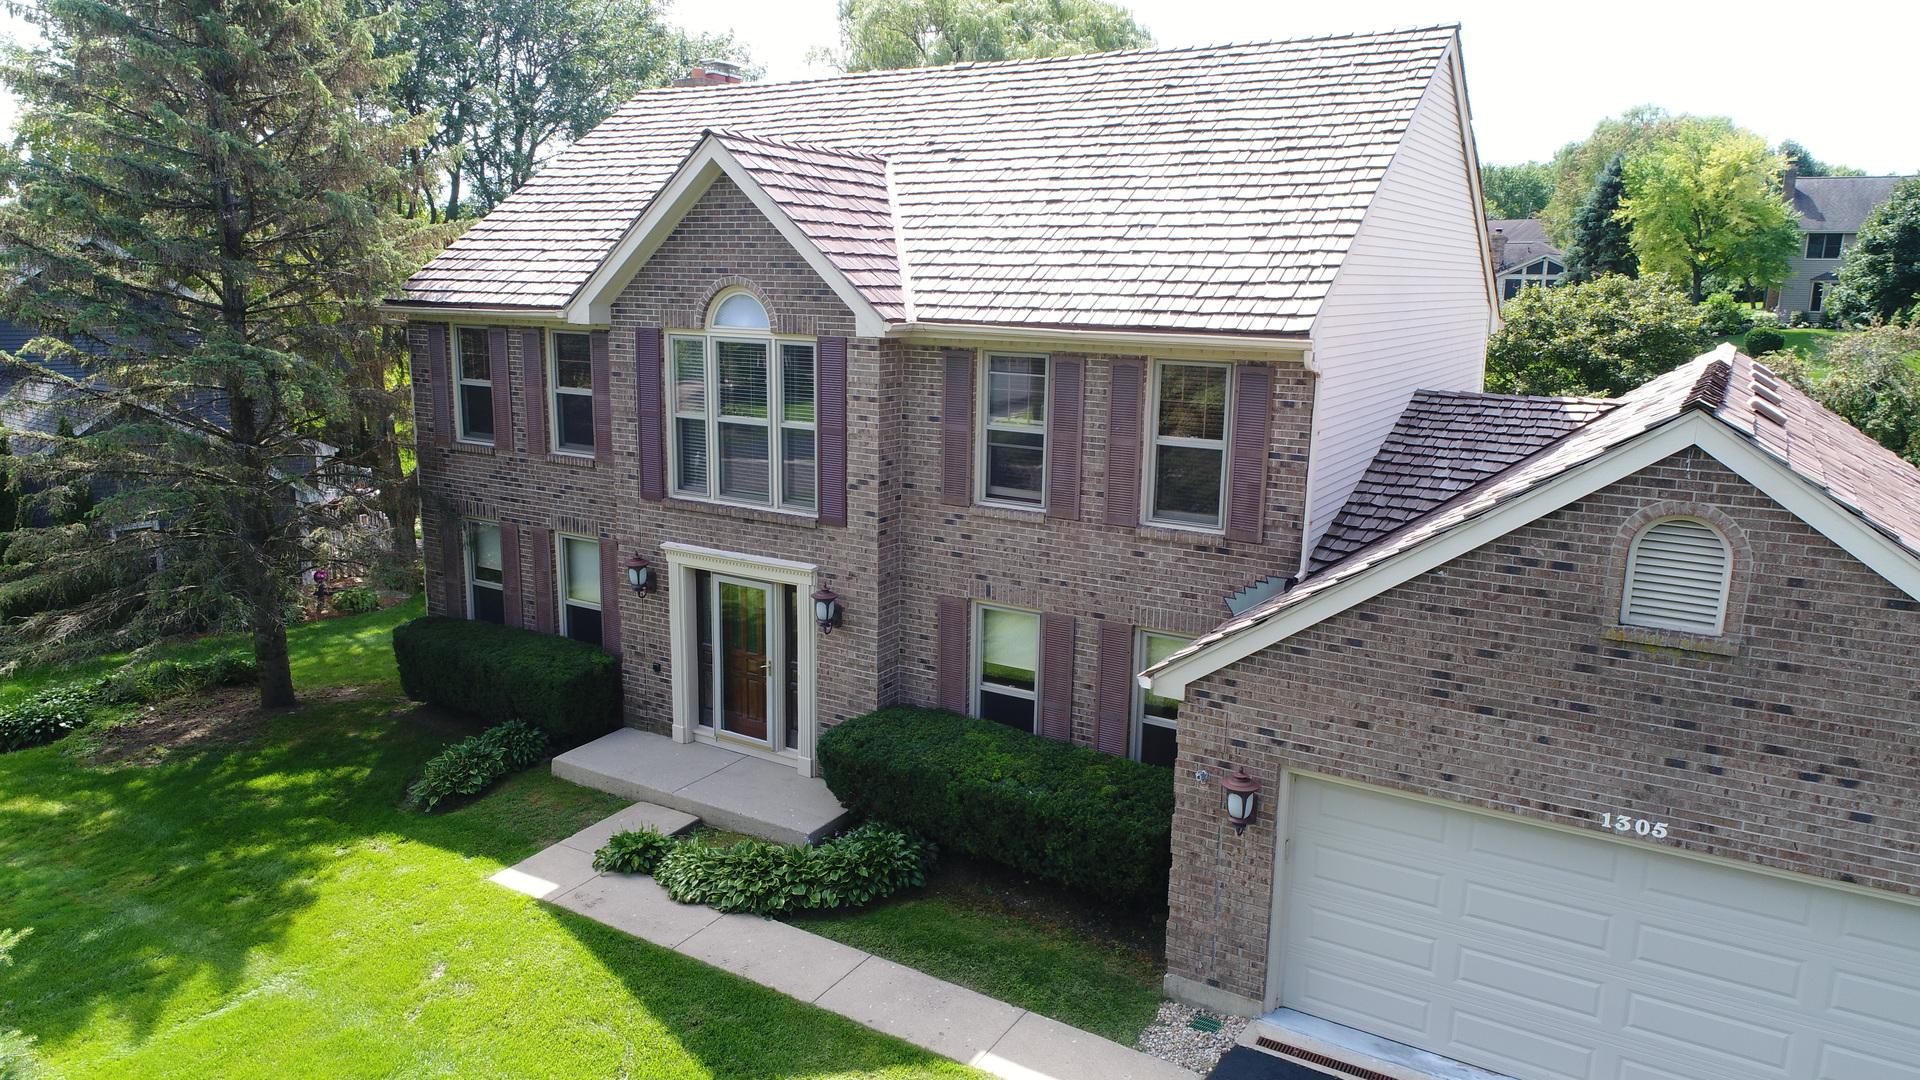 1305 Gaslight, Algonquin, Illinois, 60102